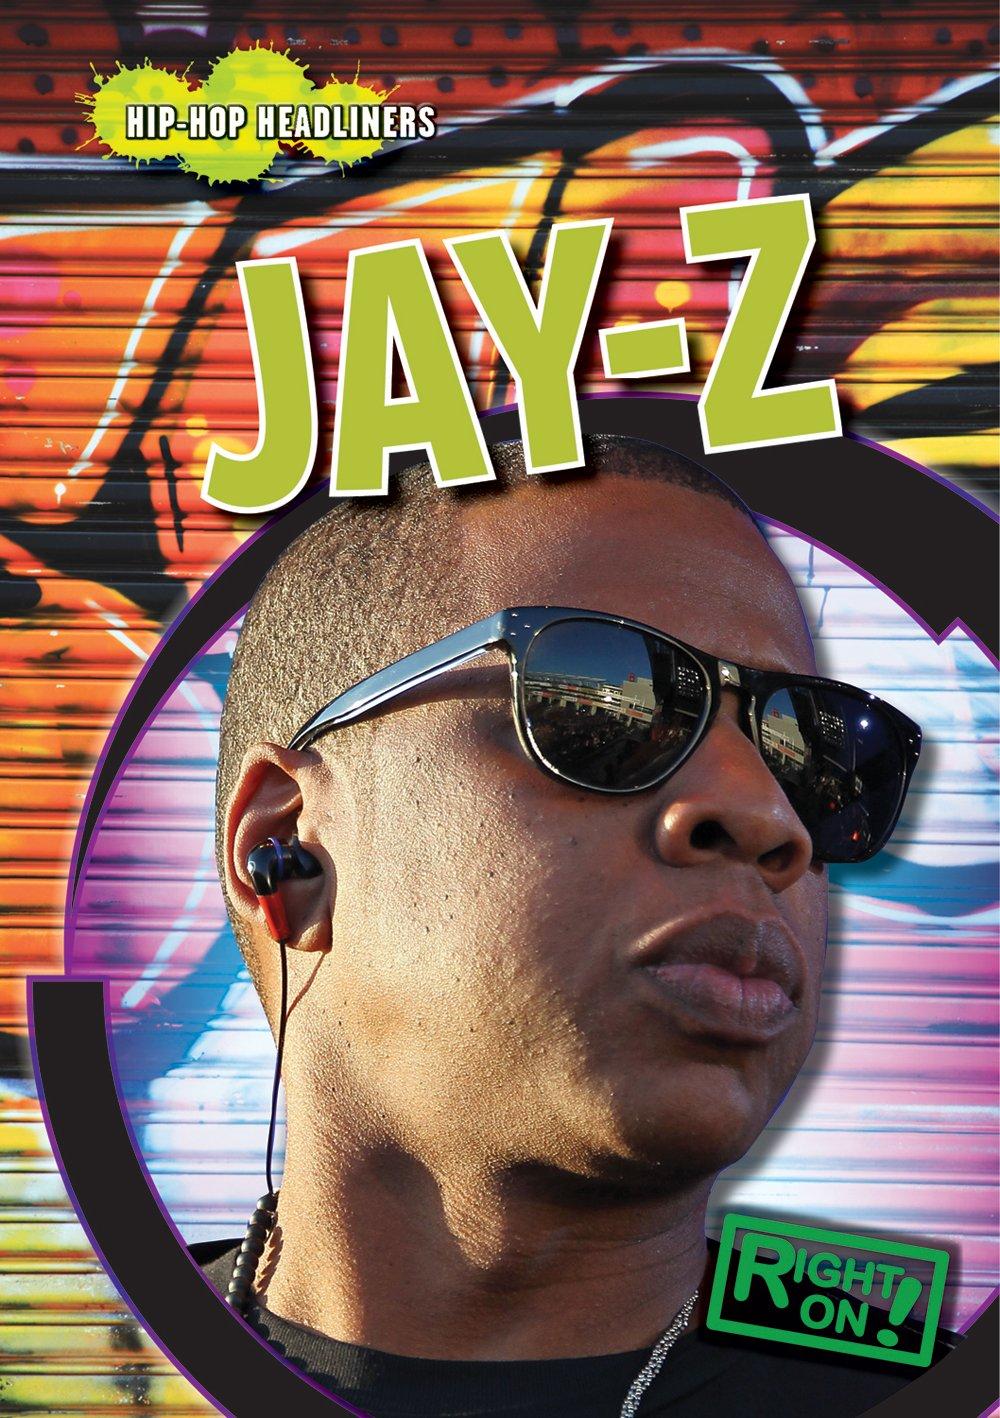 Jay-Z (Hip-Hop Headliners)